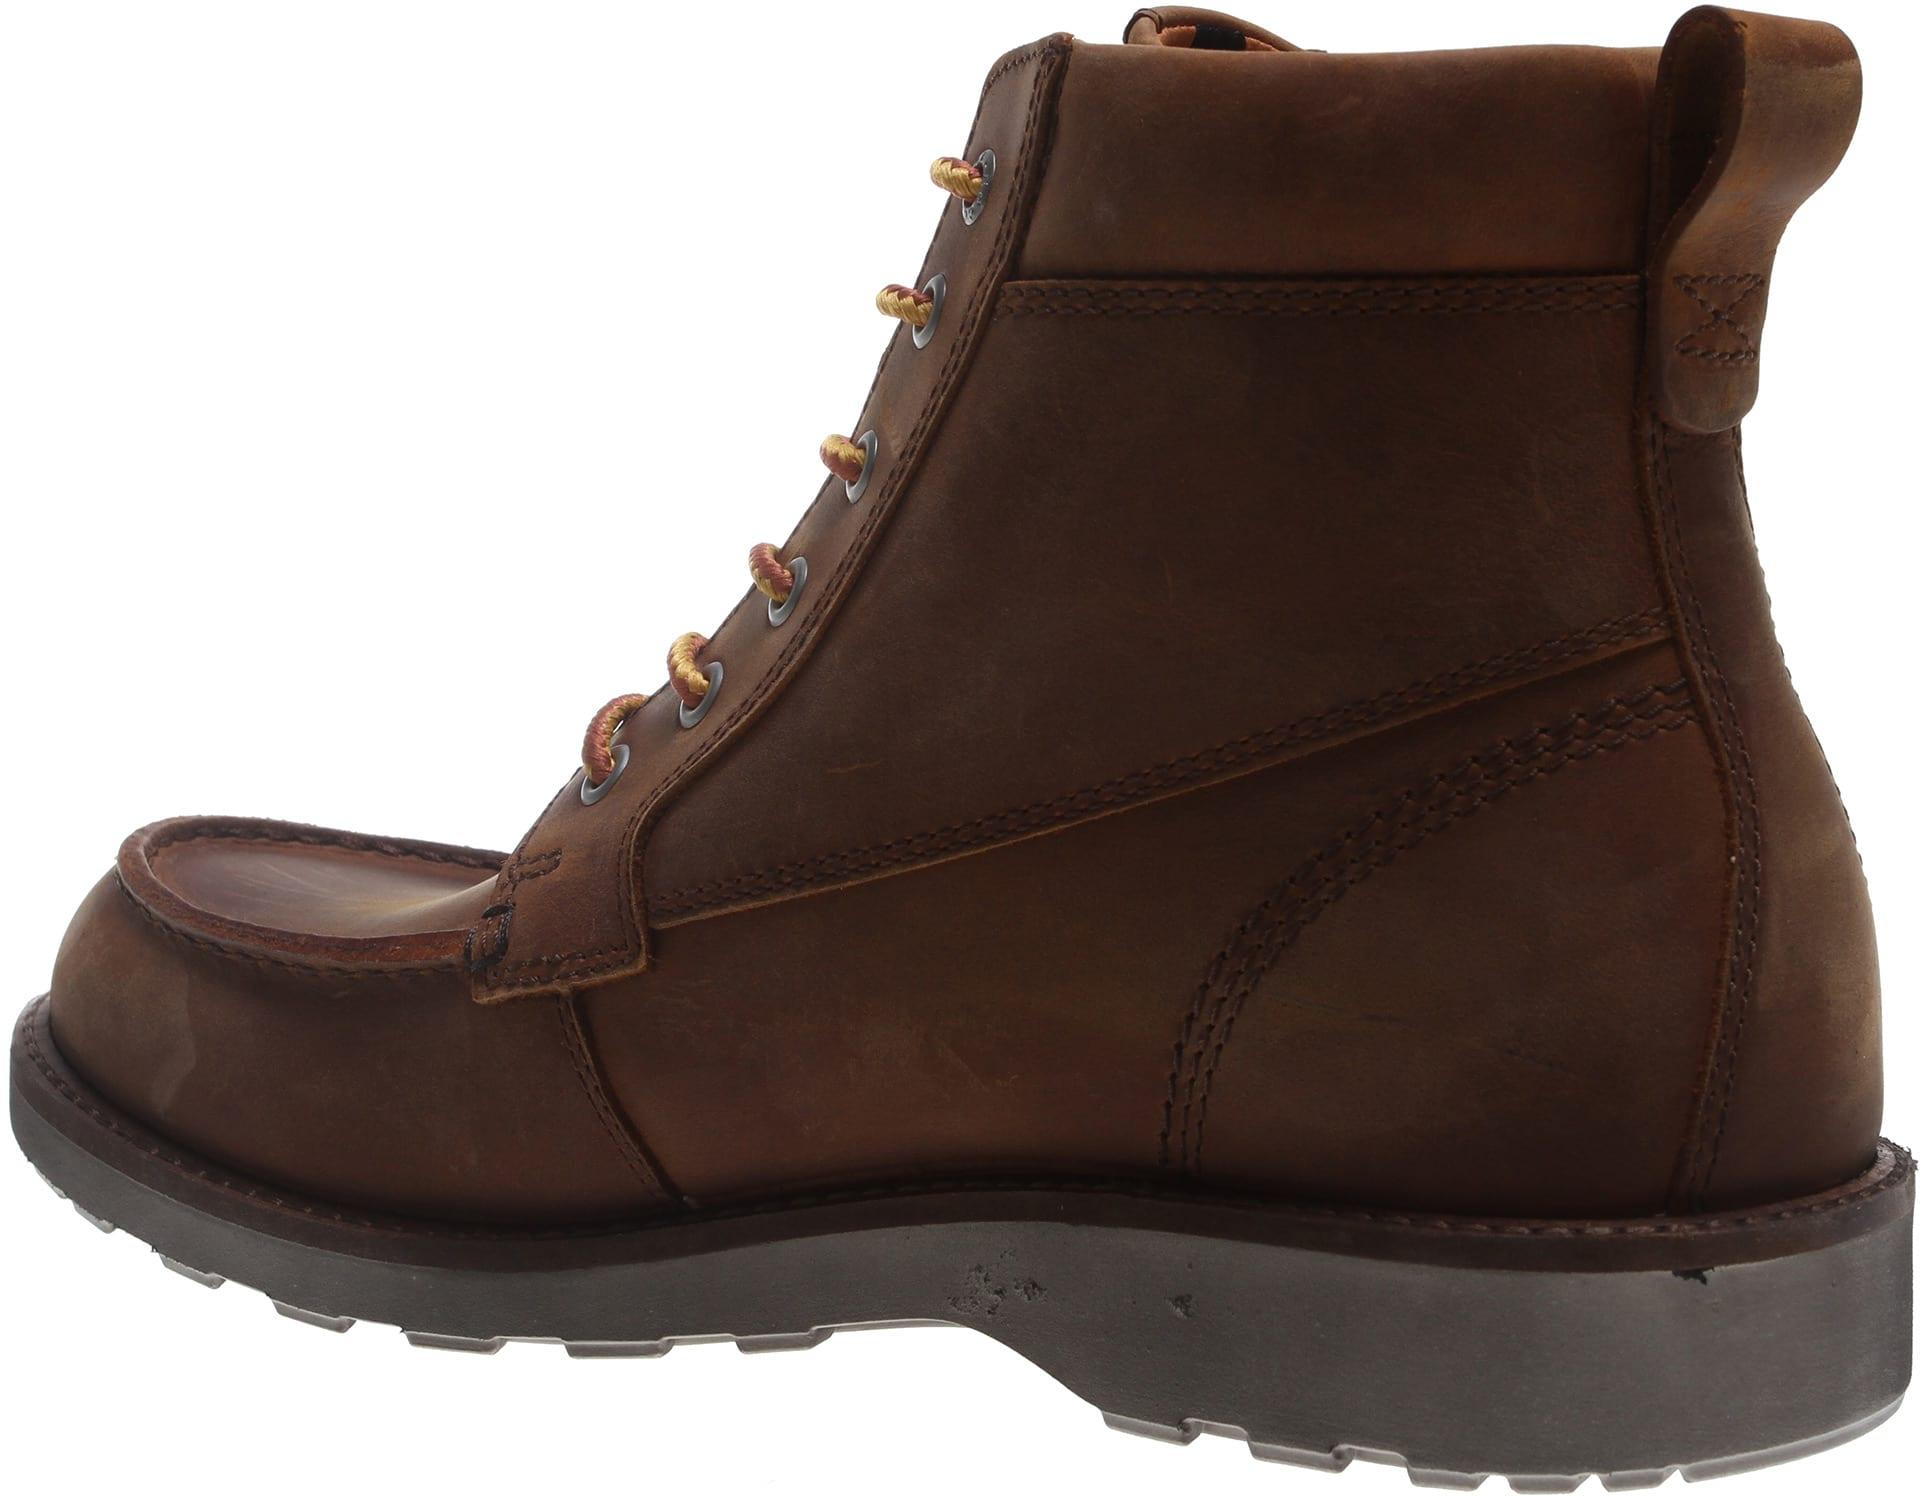 c752861075 ECCO Holbrok Moc Toe Boots - thumbnail 3